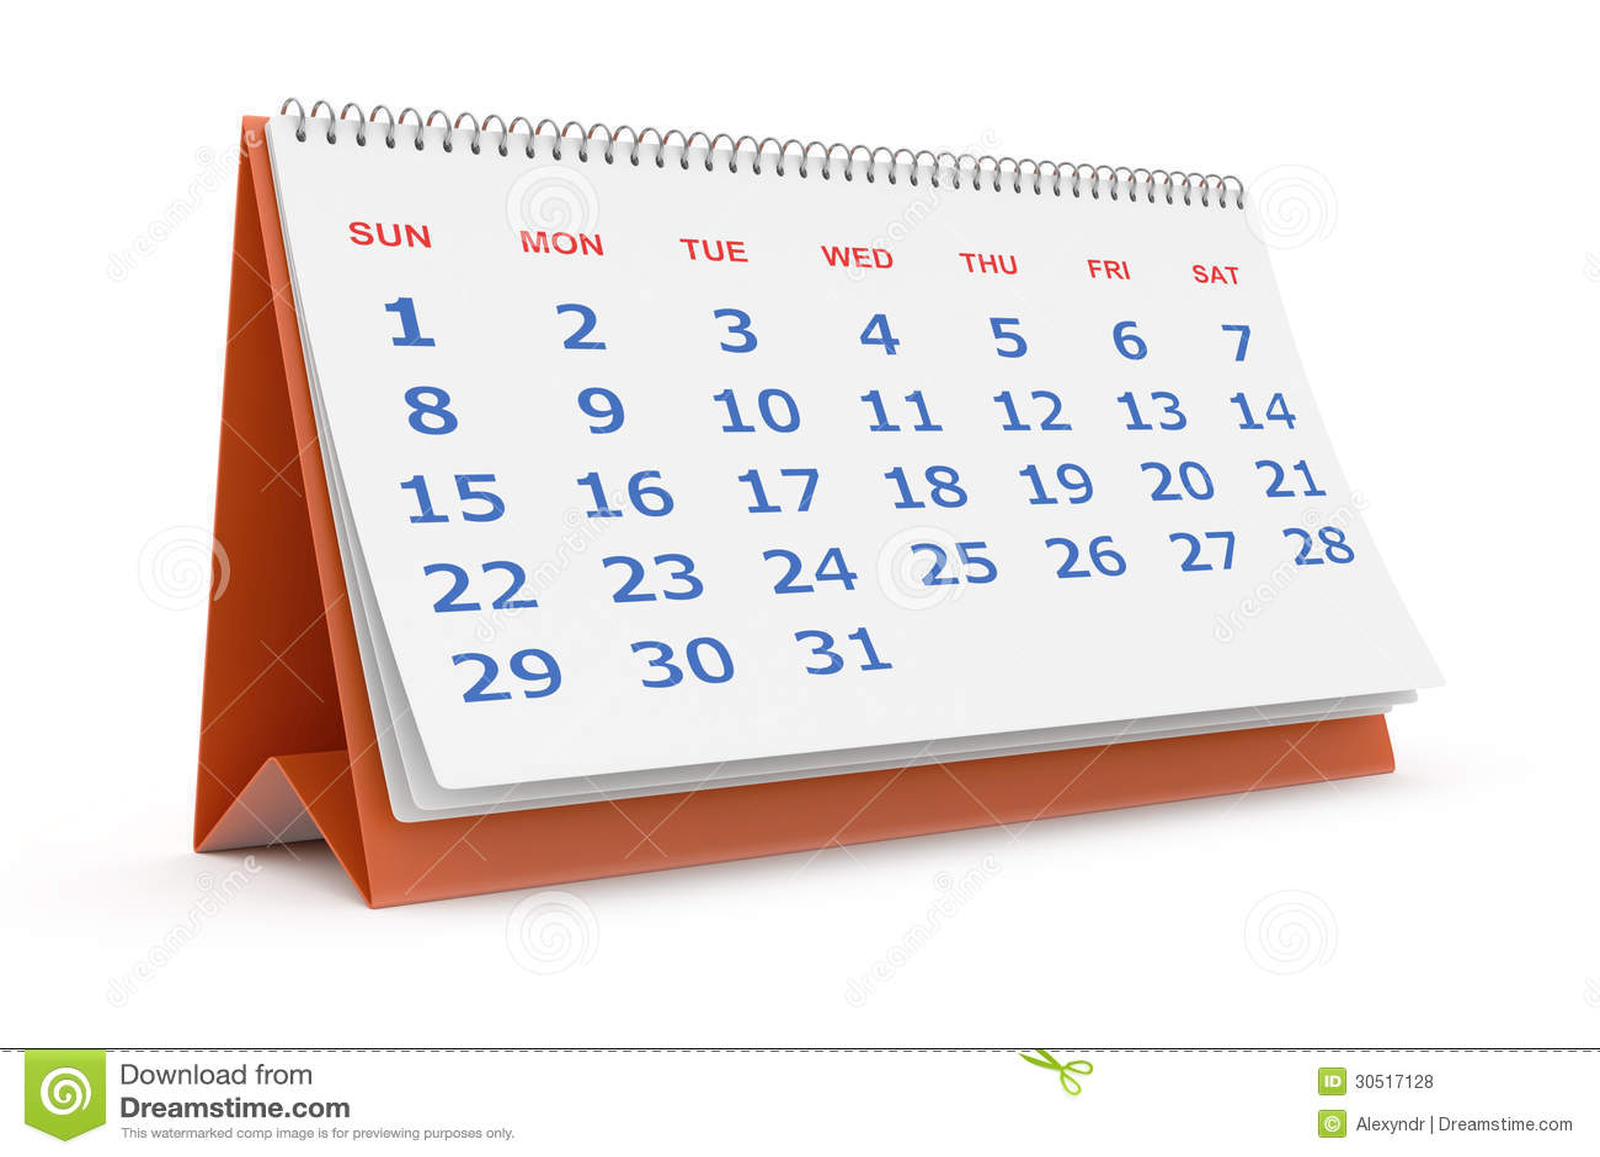 calendrier de bureau illustration stock illustration du jour 30517128. Black Bedroom Furniture Sets. Home Design Ideas